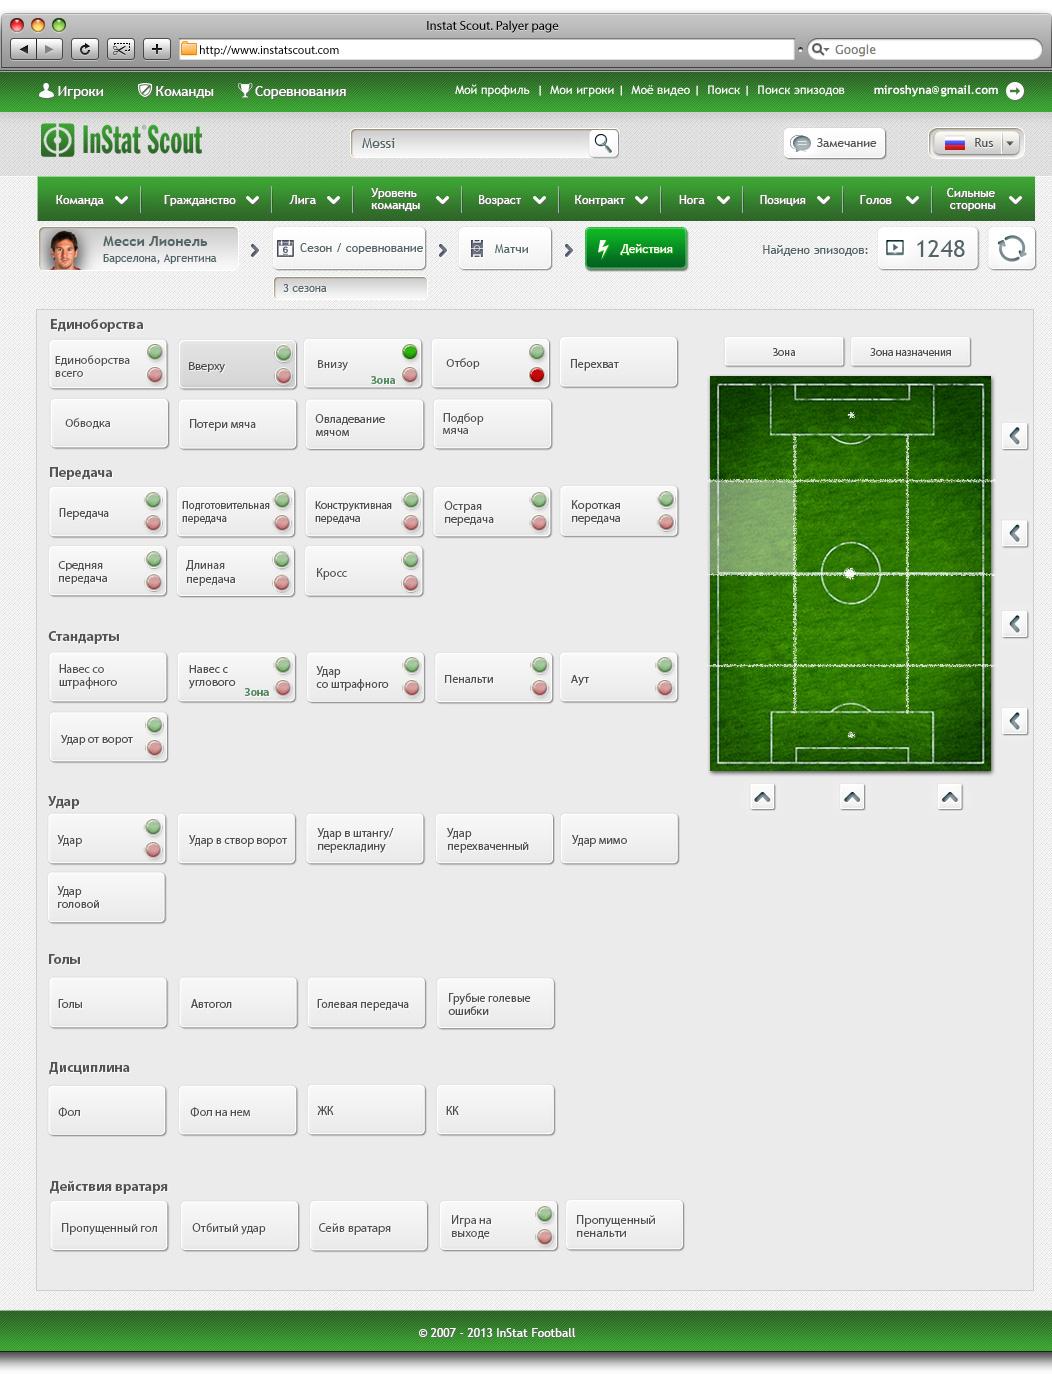 Soccer statistics portal and CRM system   Mariya Miroshyna